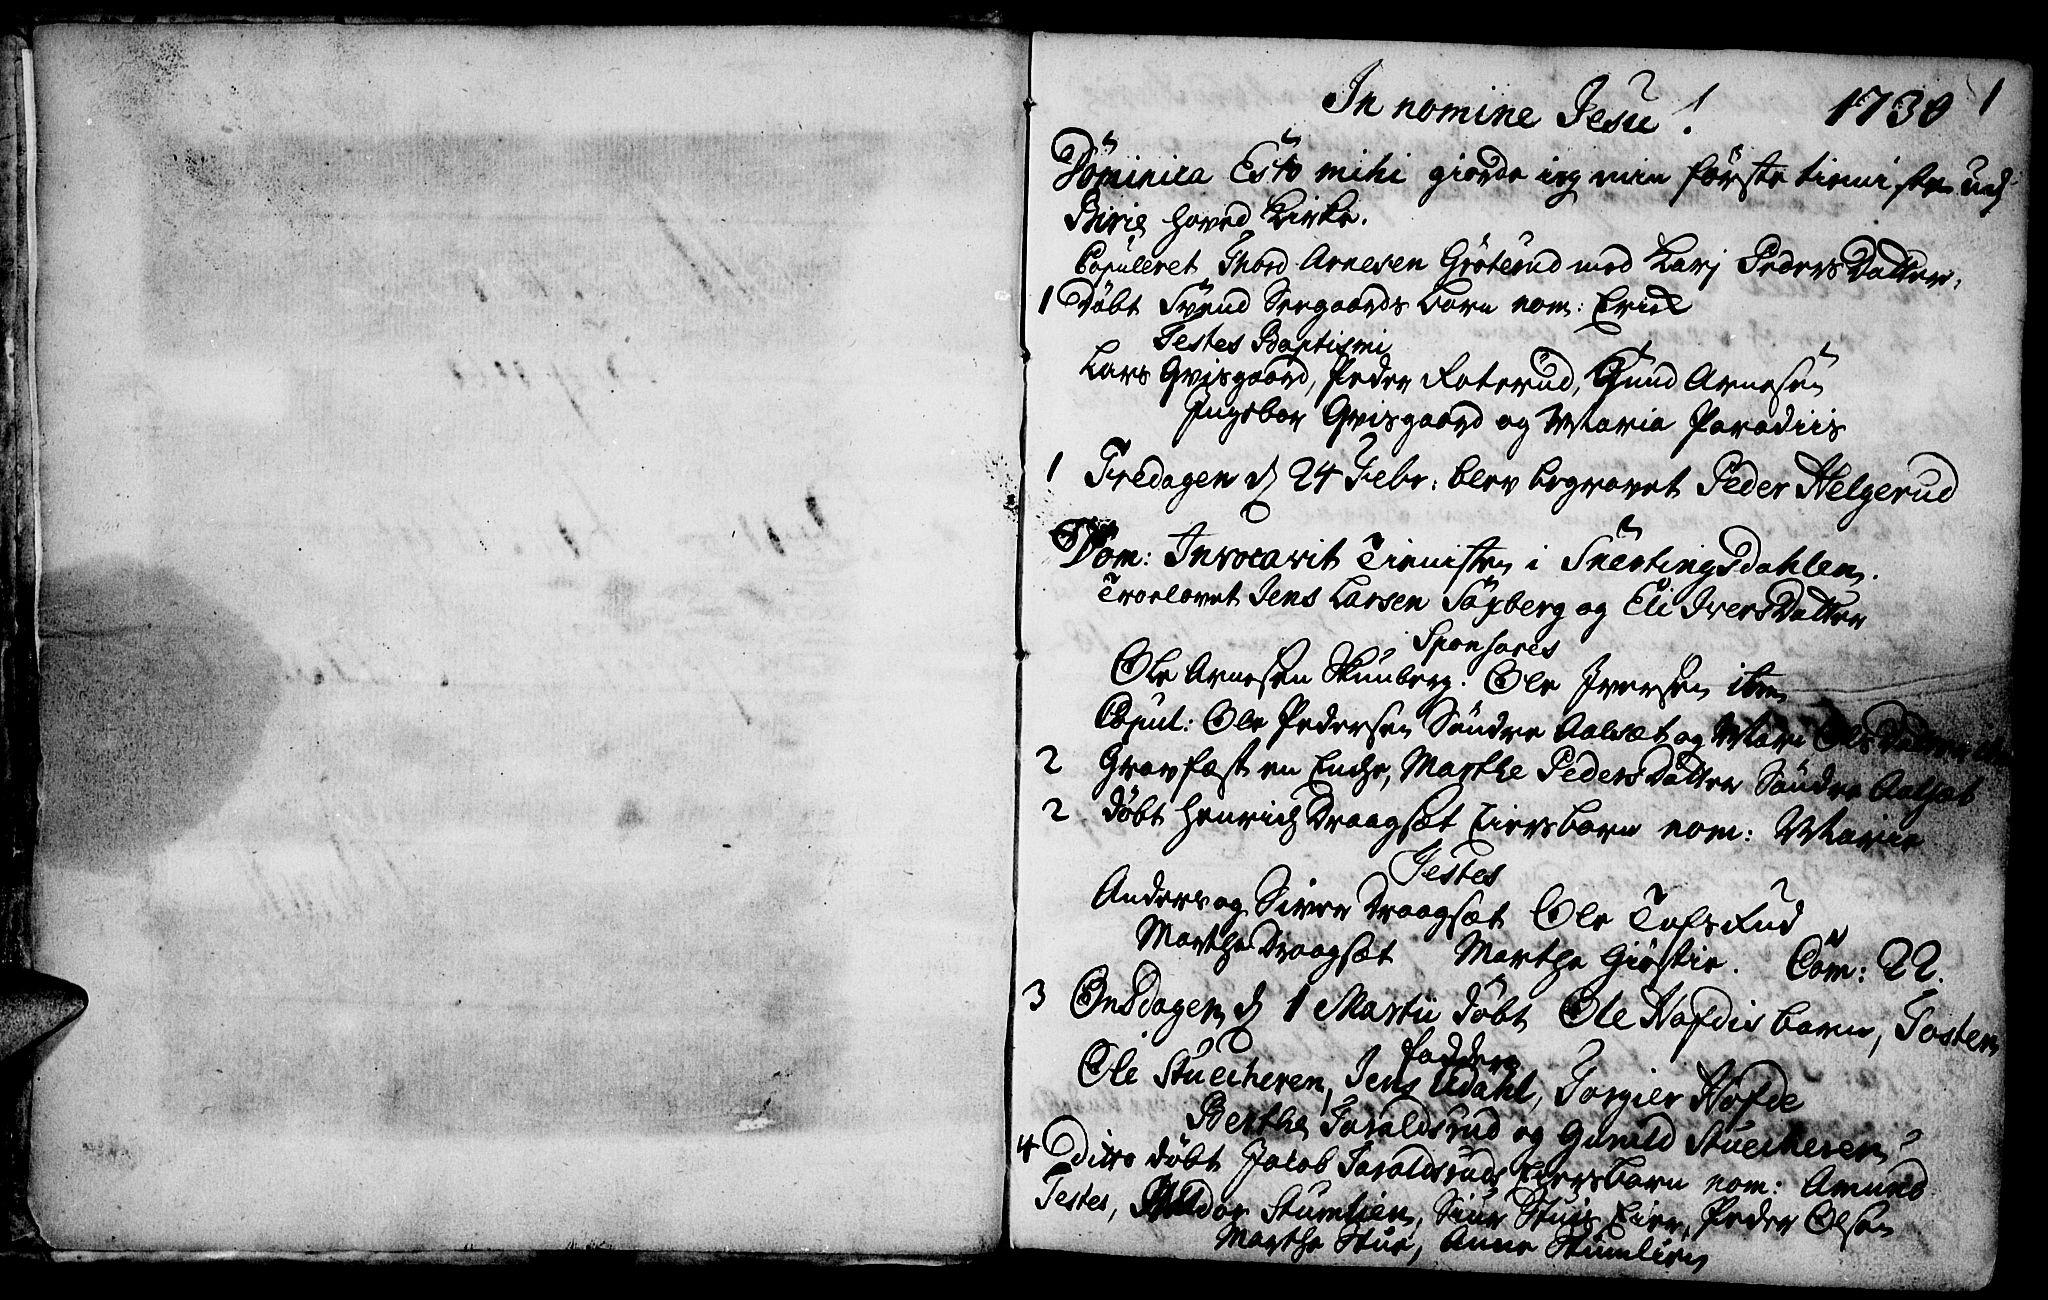 SAH, Biri prestekontor, Ministerialbok nr. 1, 1730-1754, s. 1